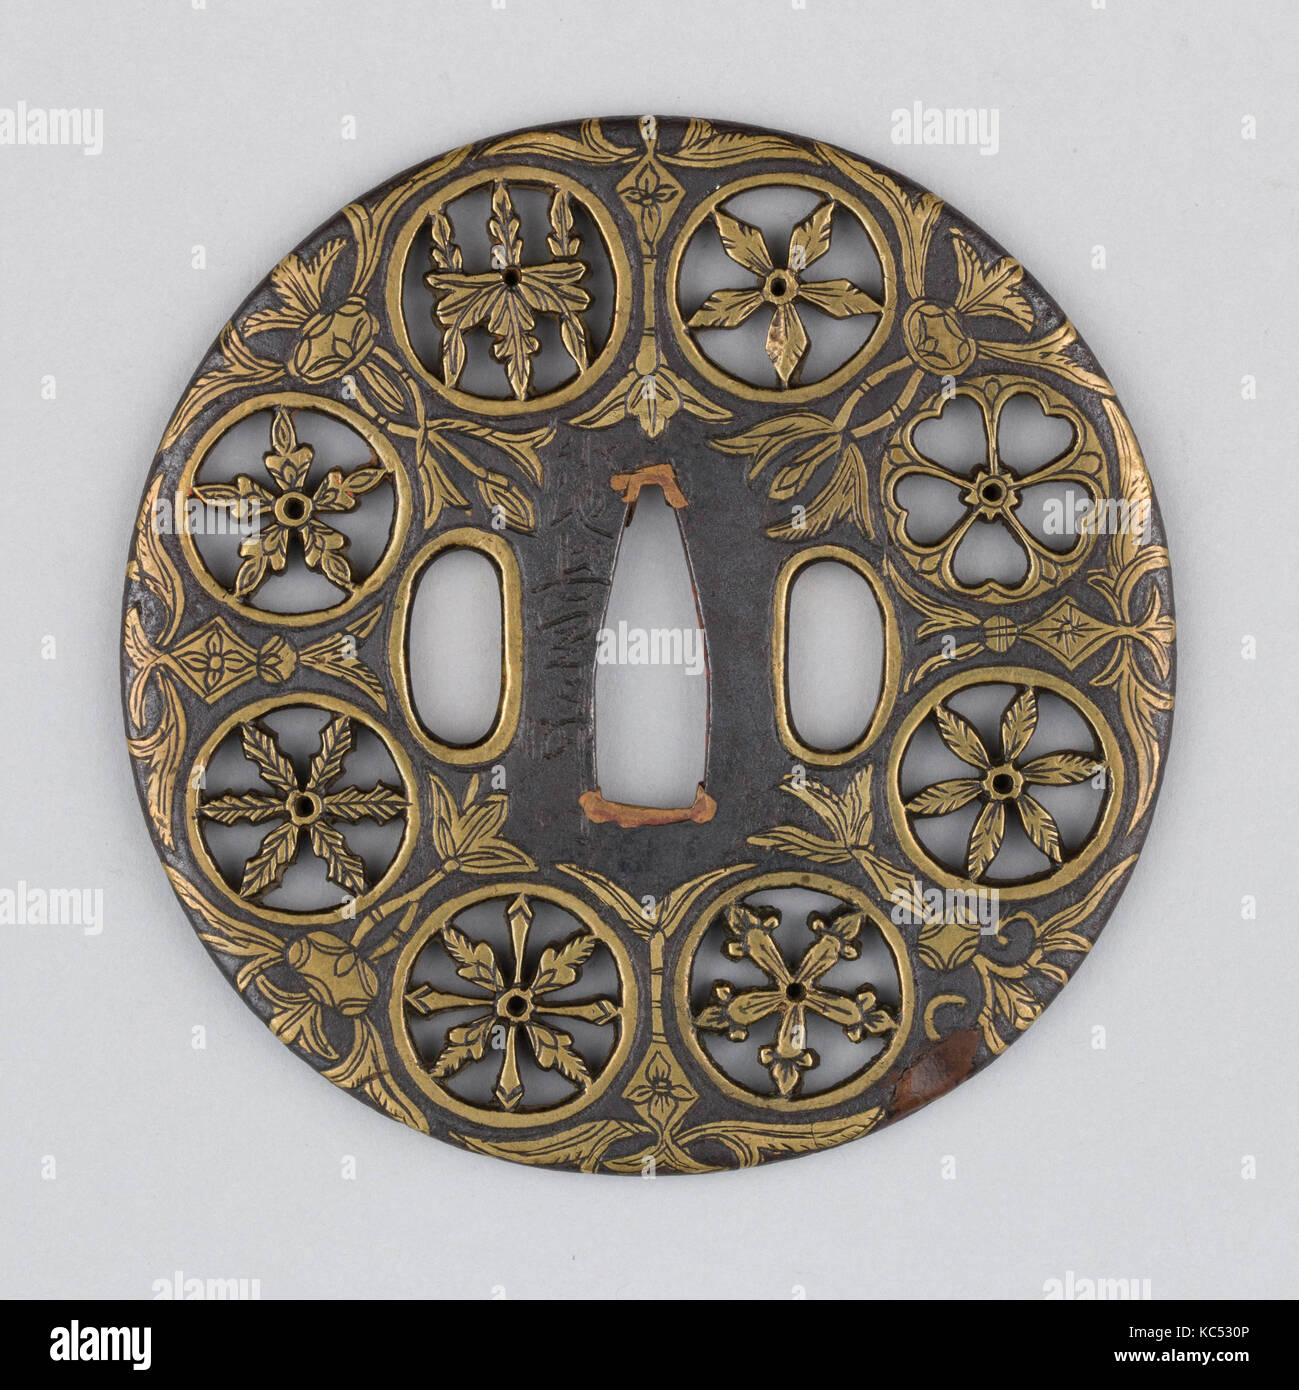 Sword guard tsuba 16th century japanese iron brass copper sword guard tsuba 16th century japanese iron brass copper diam 3 58 in 92 cm thickness 316 in 05 cm wt 54 buycottarizona Image collections